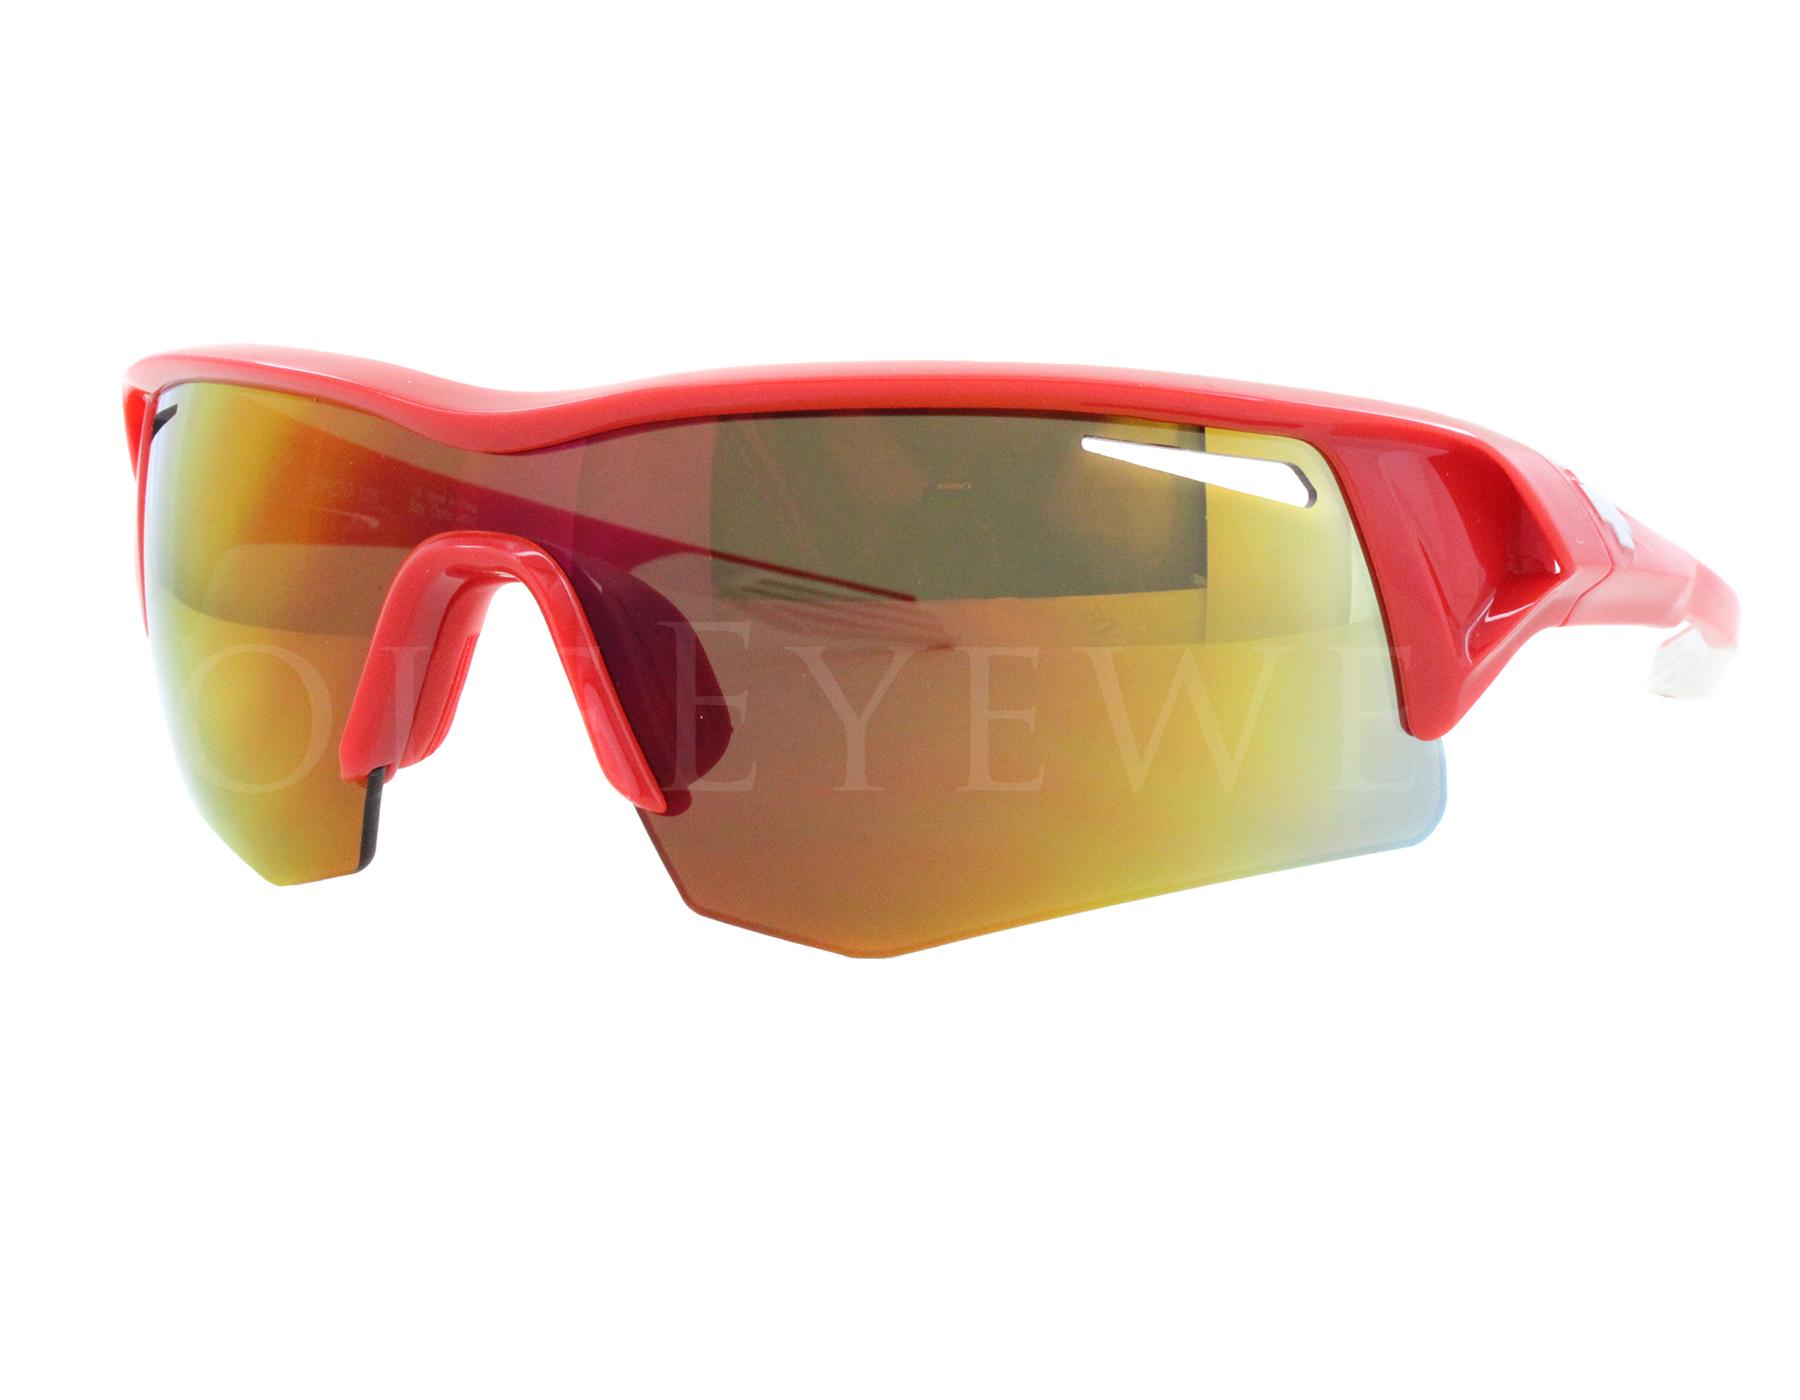 456248b490edb Details about NEW Spy Optics Screw 673019512083 Red   Bronze Red Spectra  Sunglasses